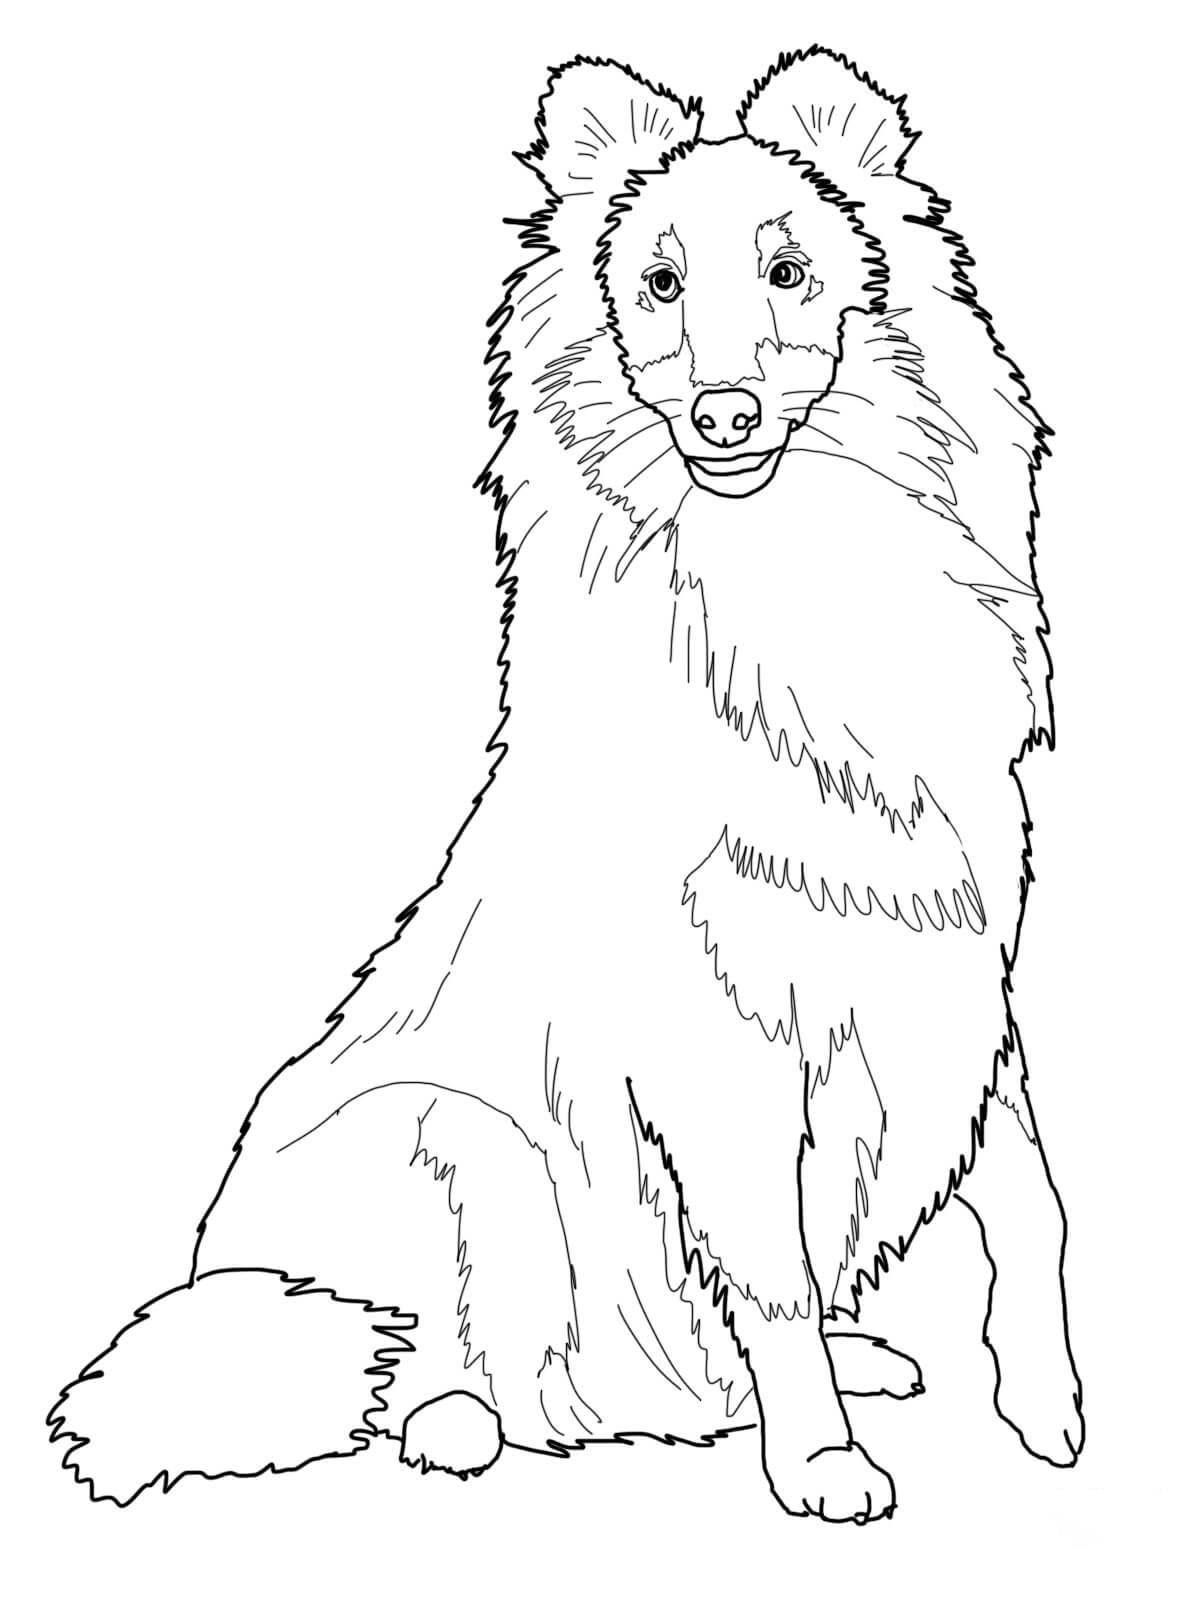 Sheltie Shetland Sheep dog